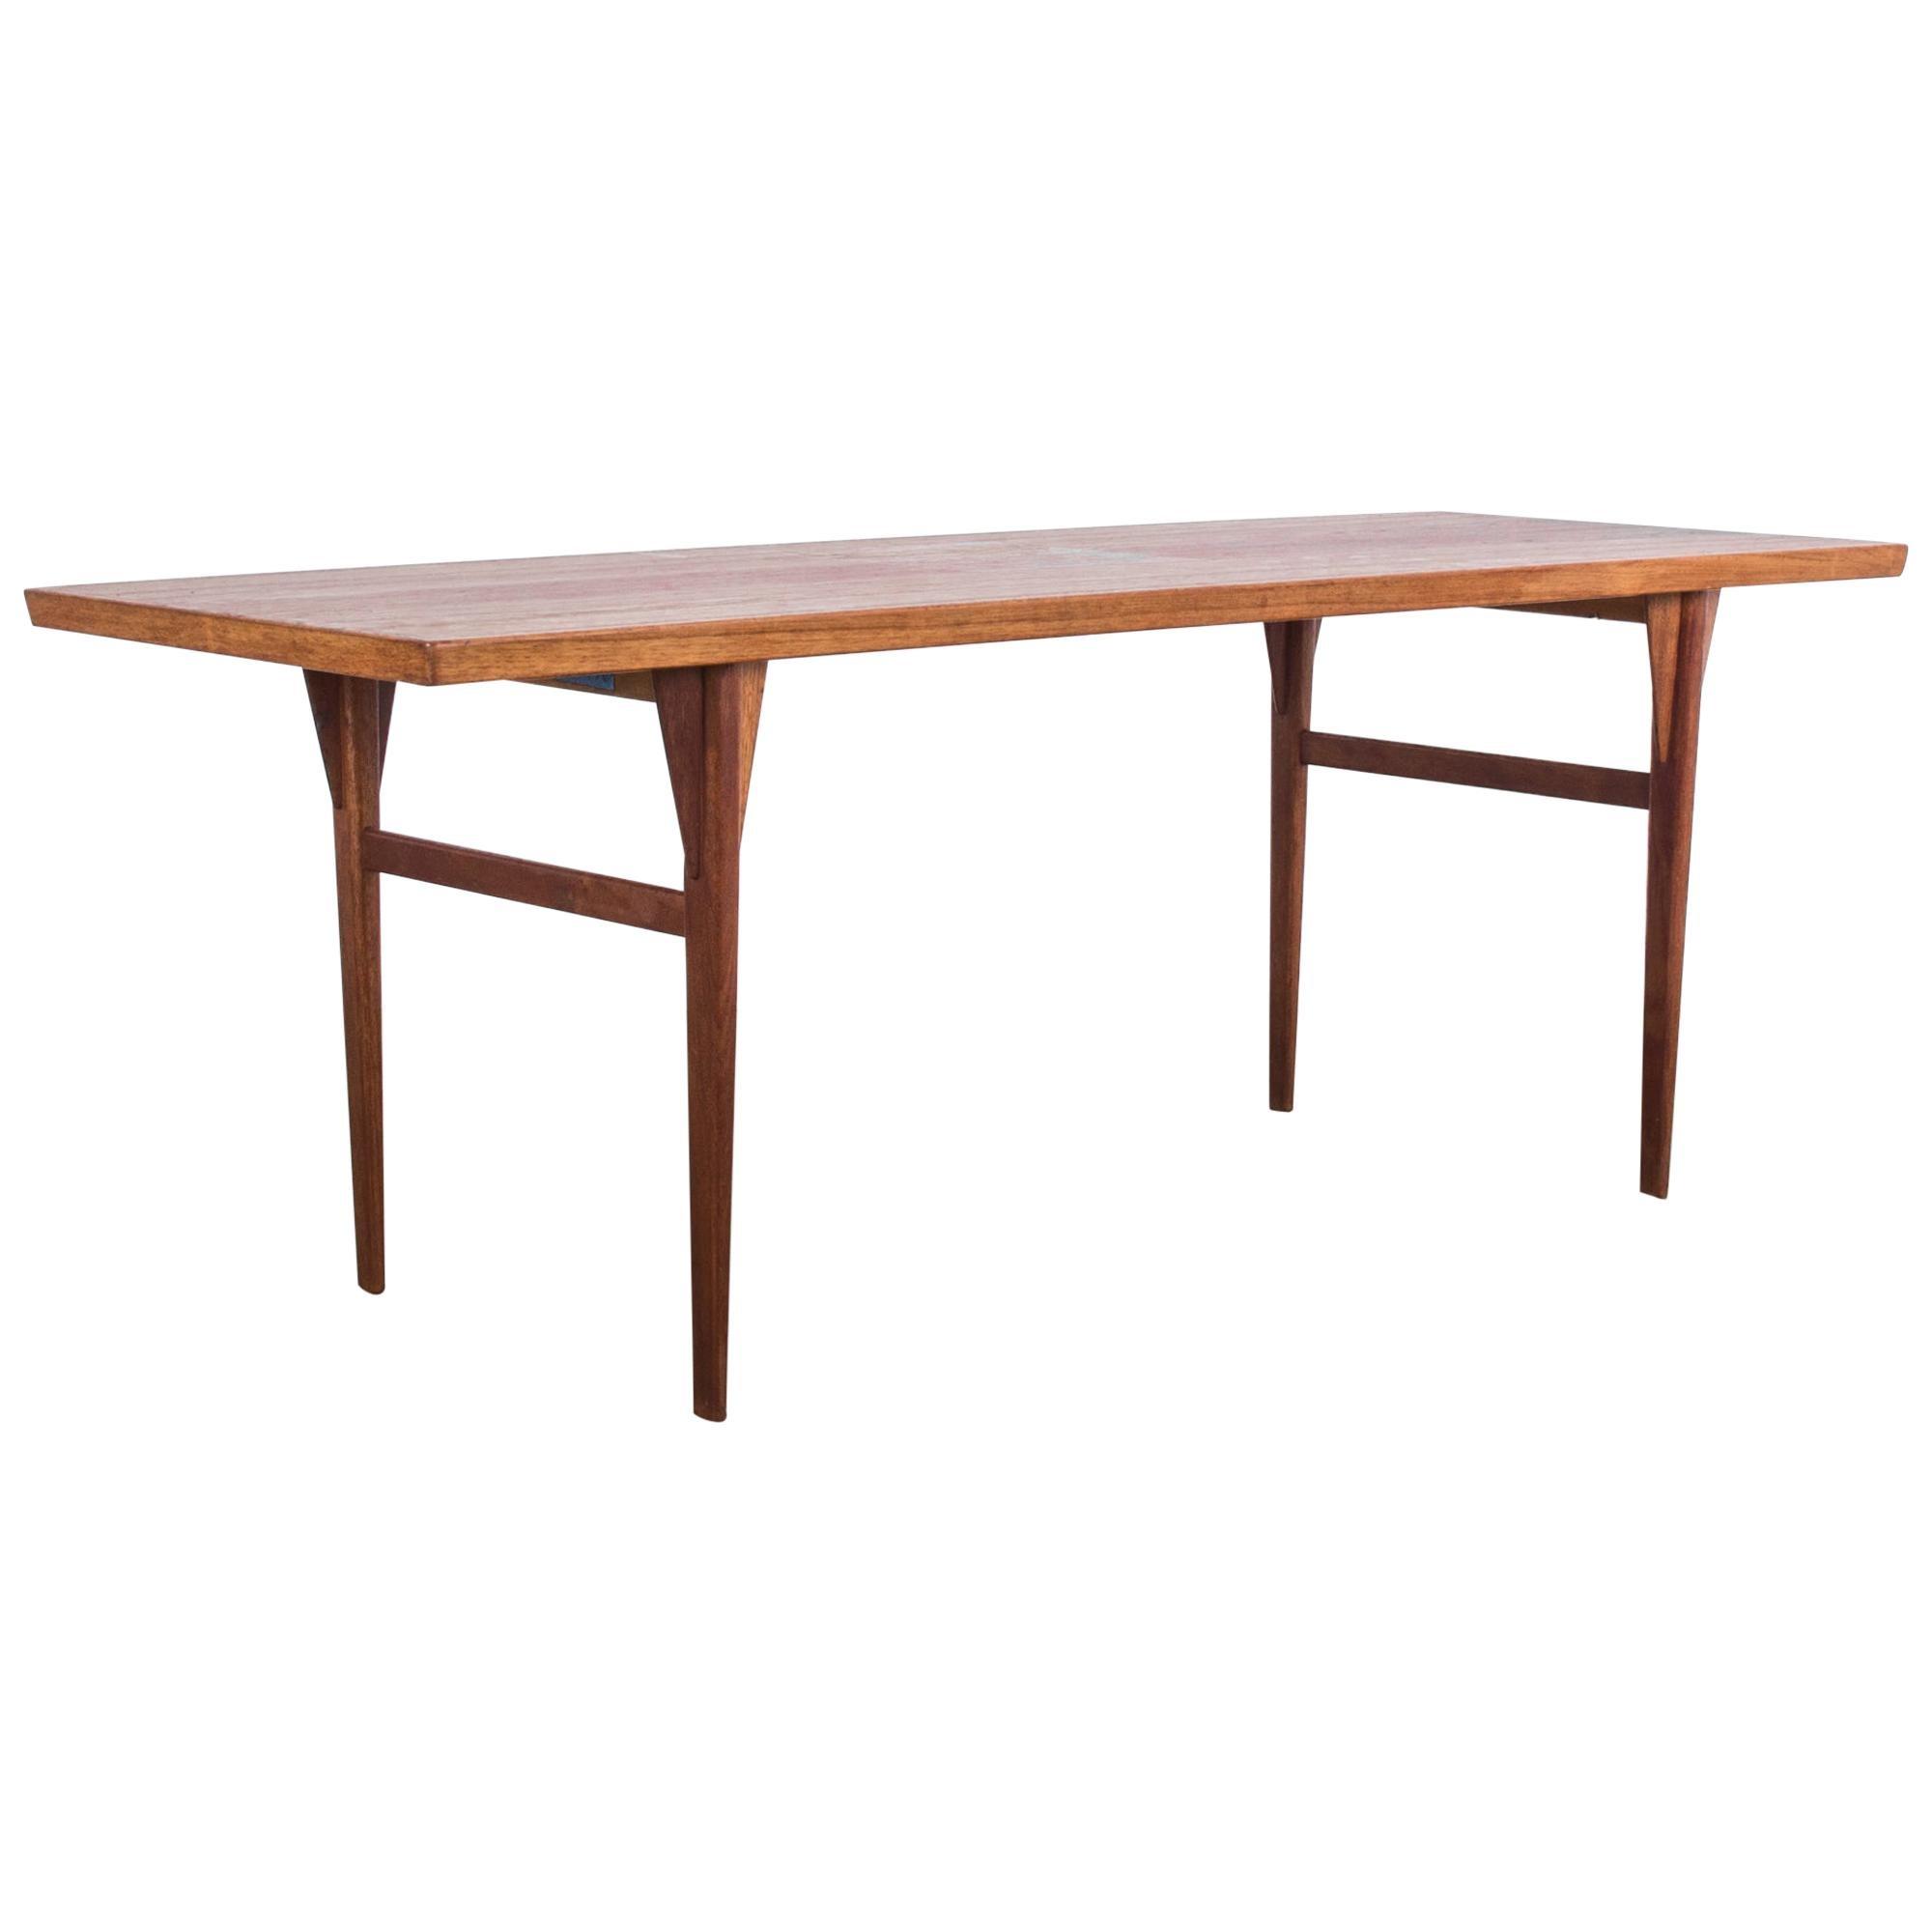 1960s Danish Modern Teak Coffee Table